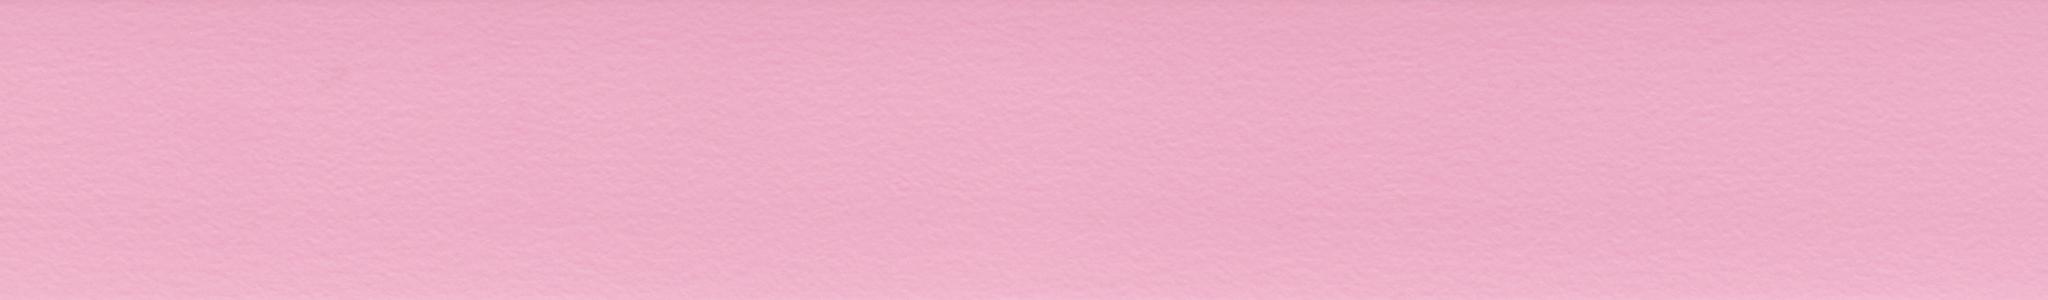 HU 137014 ABS Edge Pink Soft Pearl 107